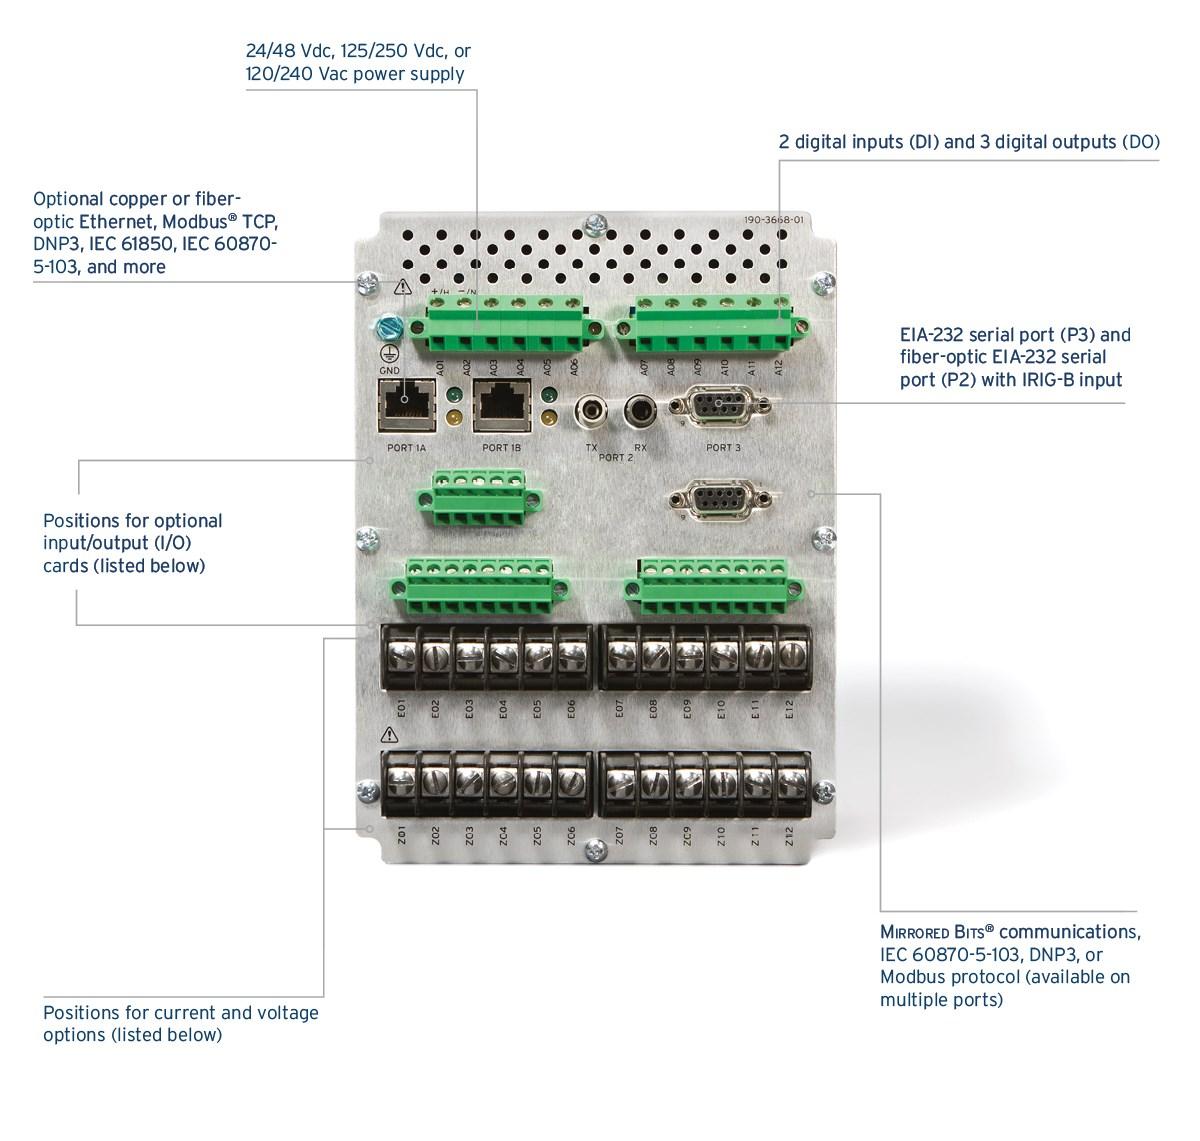 sel 787 3e 3s 4x transformer protection relay schweitzer rh selinc com SEL-787 Drawing Sel 787 Manual